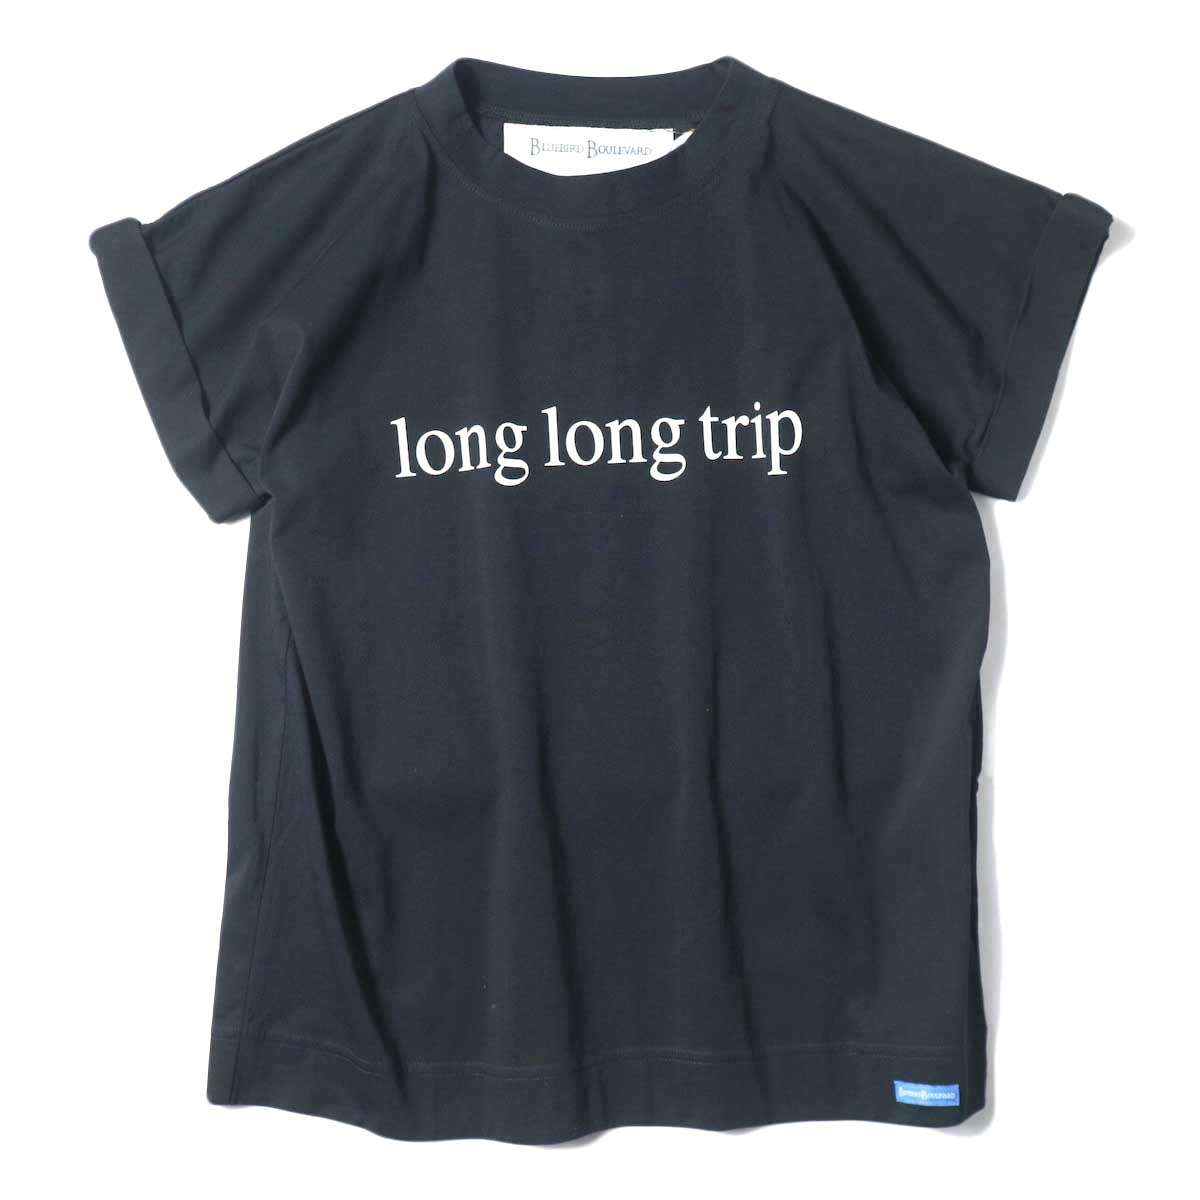 BLUEBIRD BOULEVARD / Long Long Trip ロゴTee (Black)